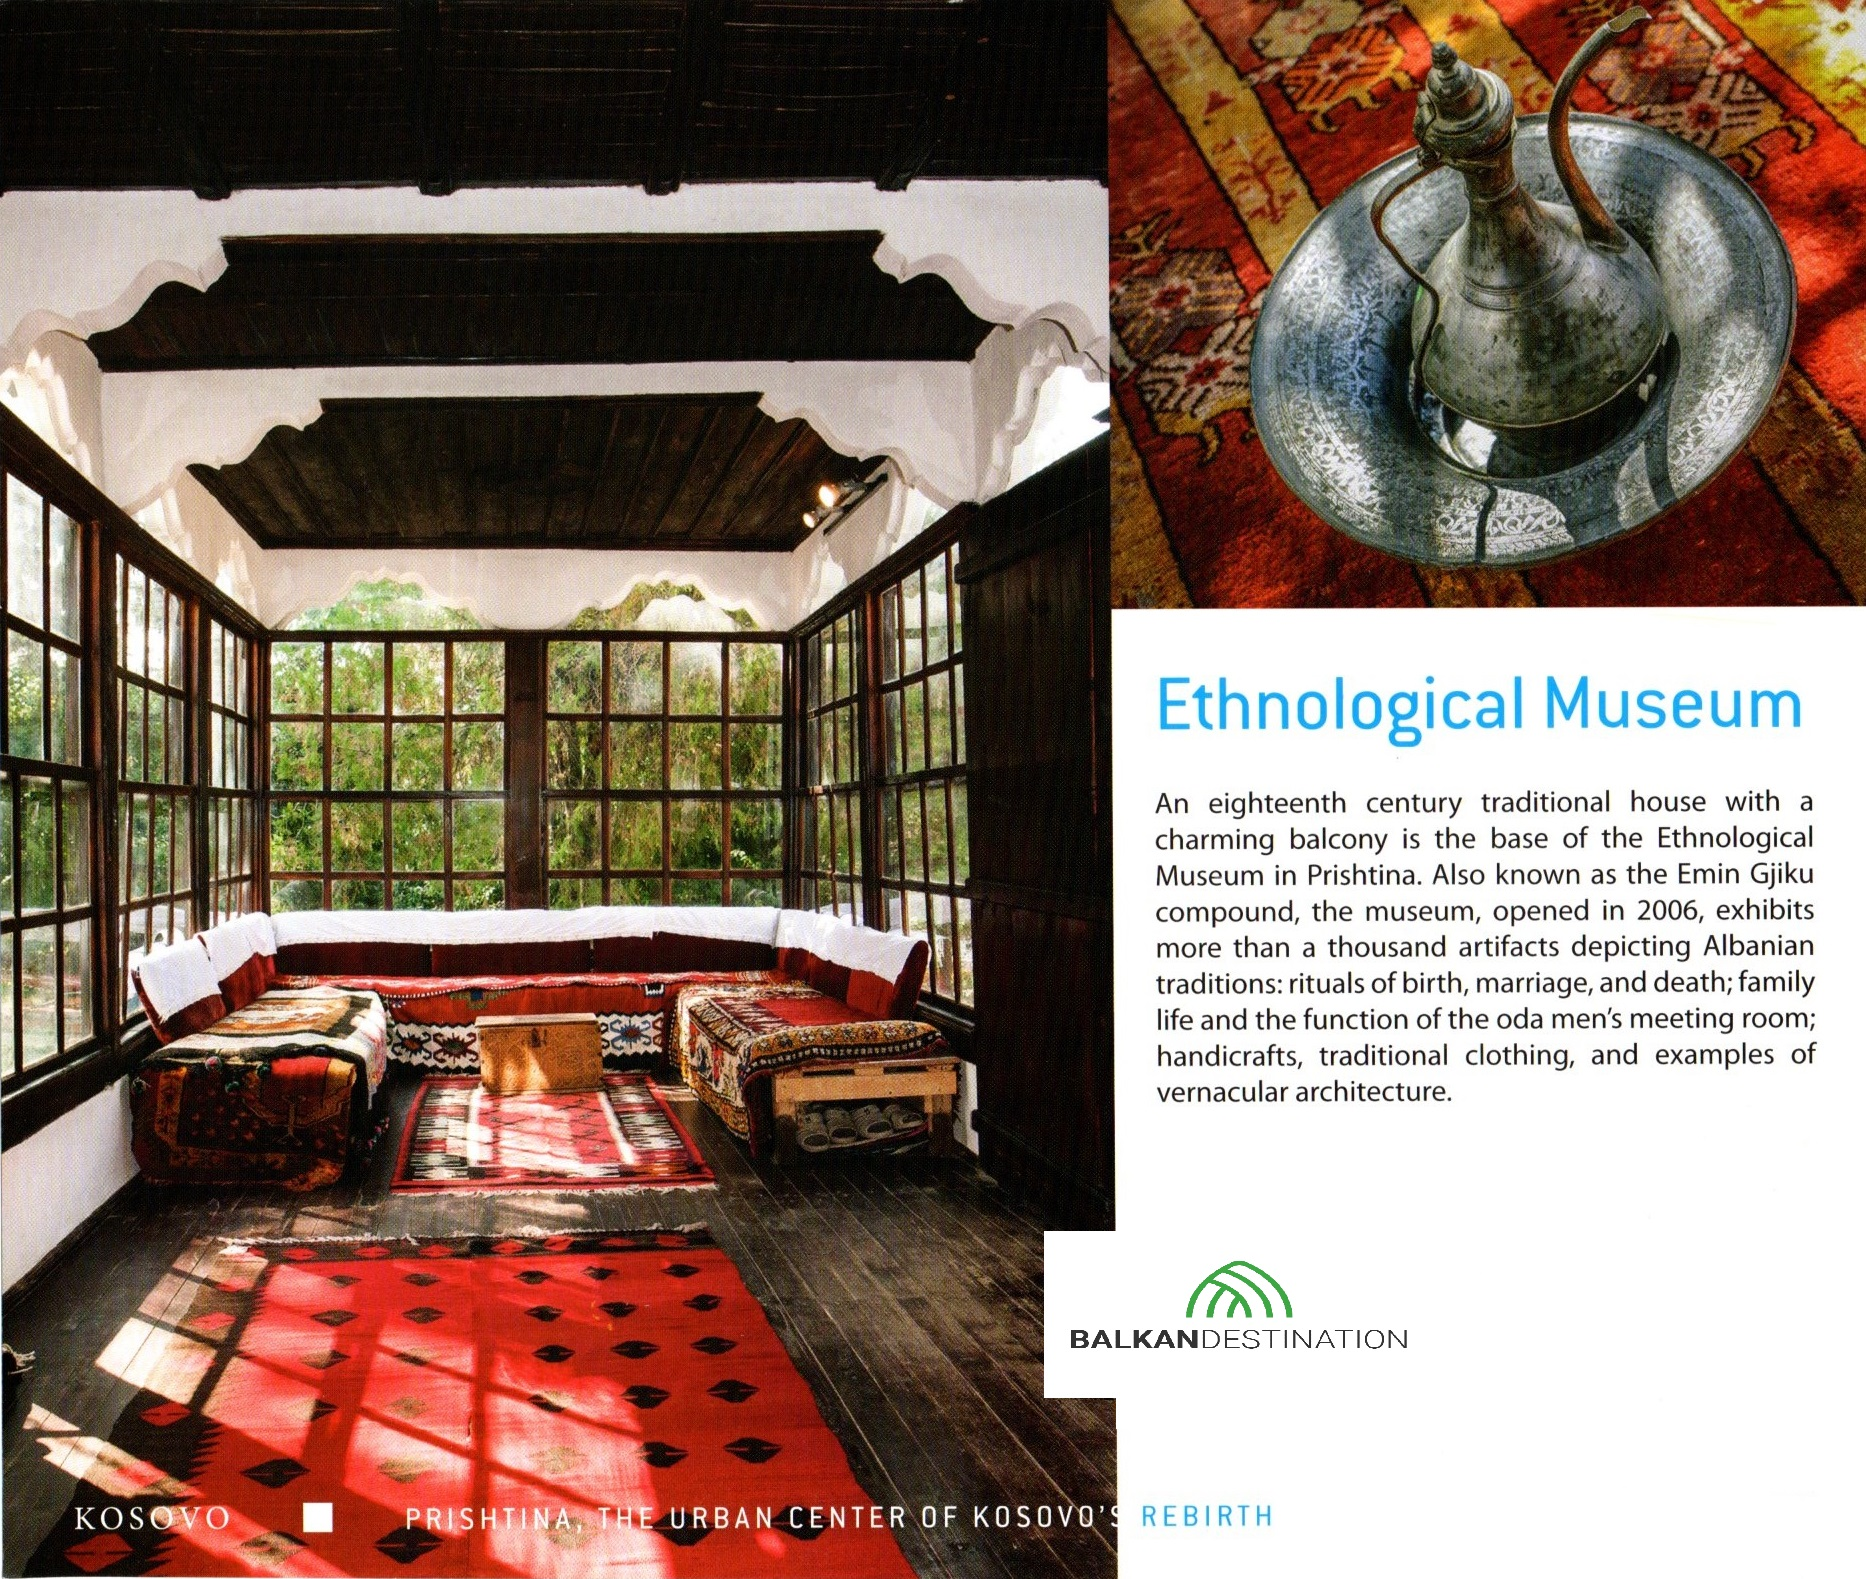 etnologicalmuseum pristina kosovo balkandestintion